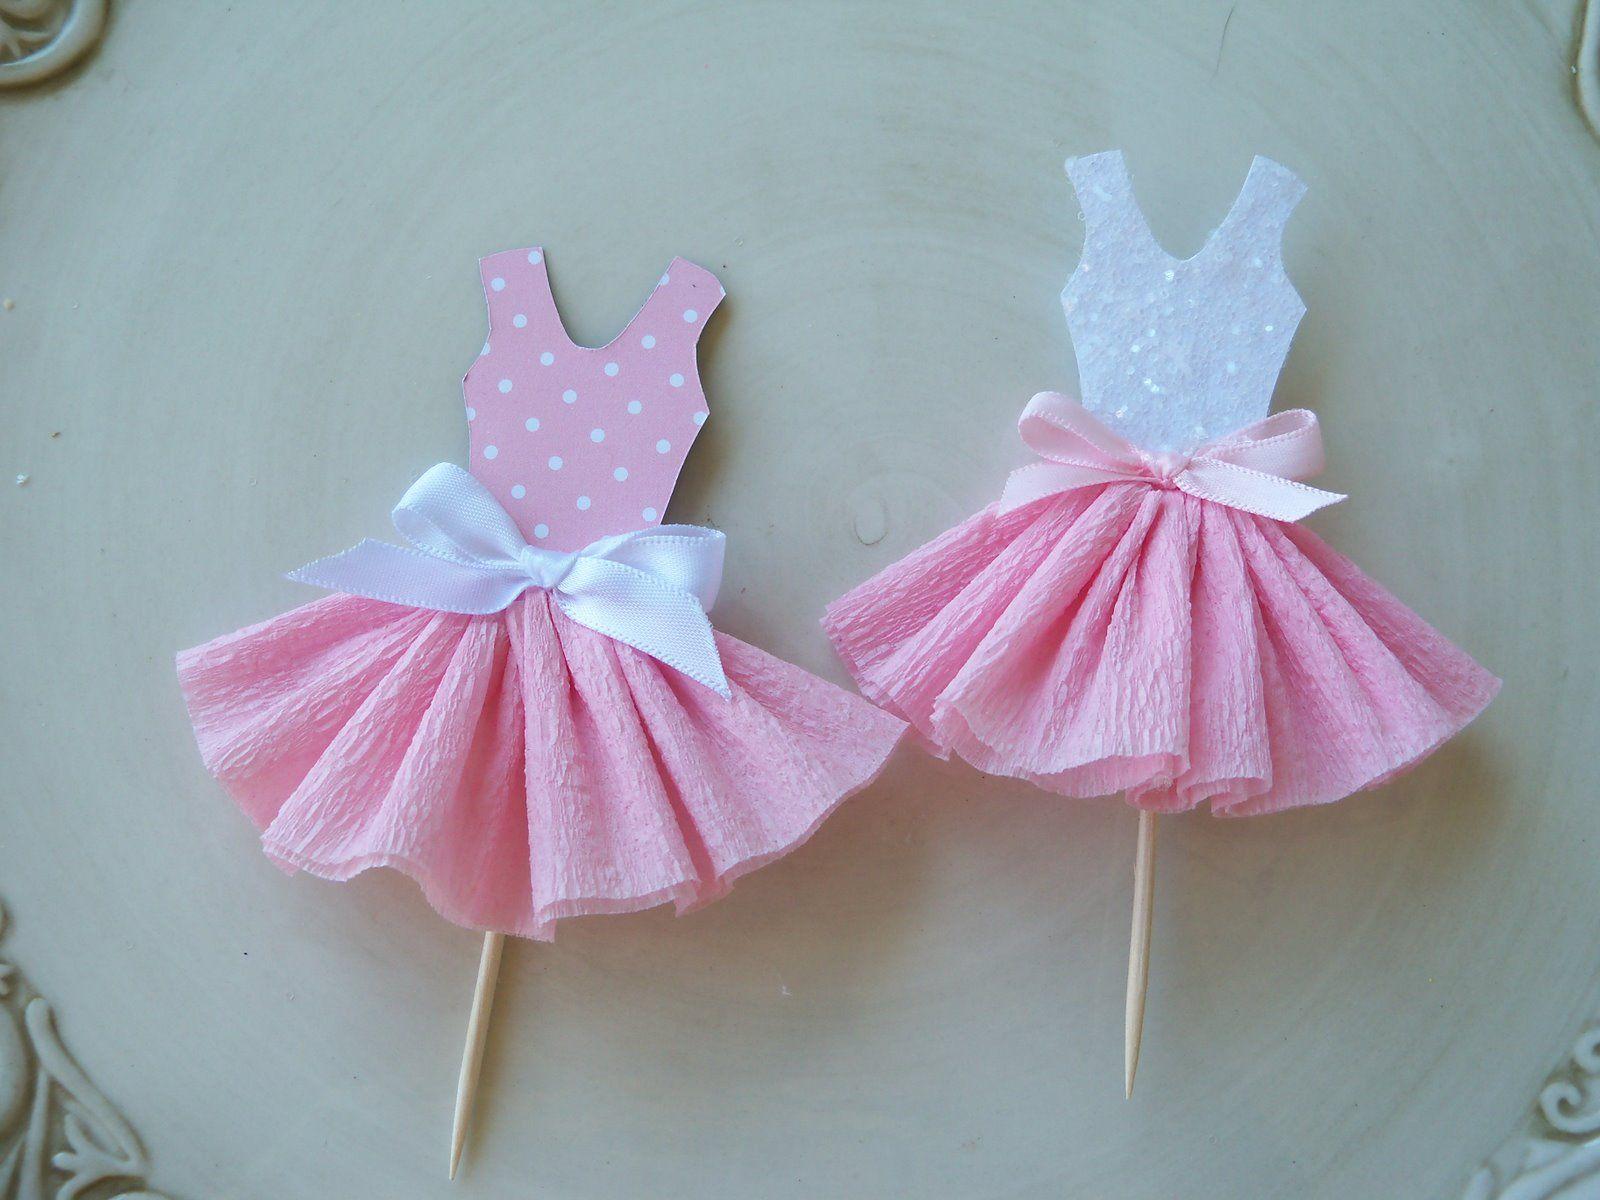 014.JPG]   enfeites de festa   Pinterest   Dress cupcakes, Craft and ...